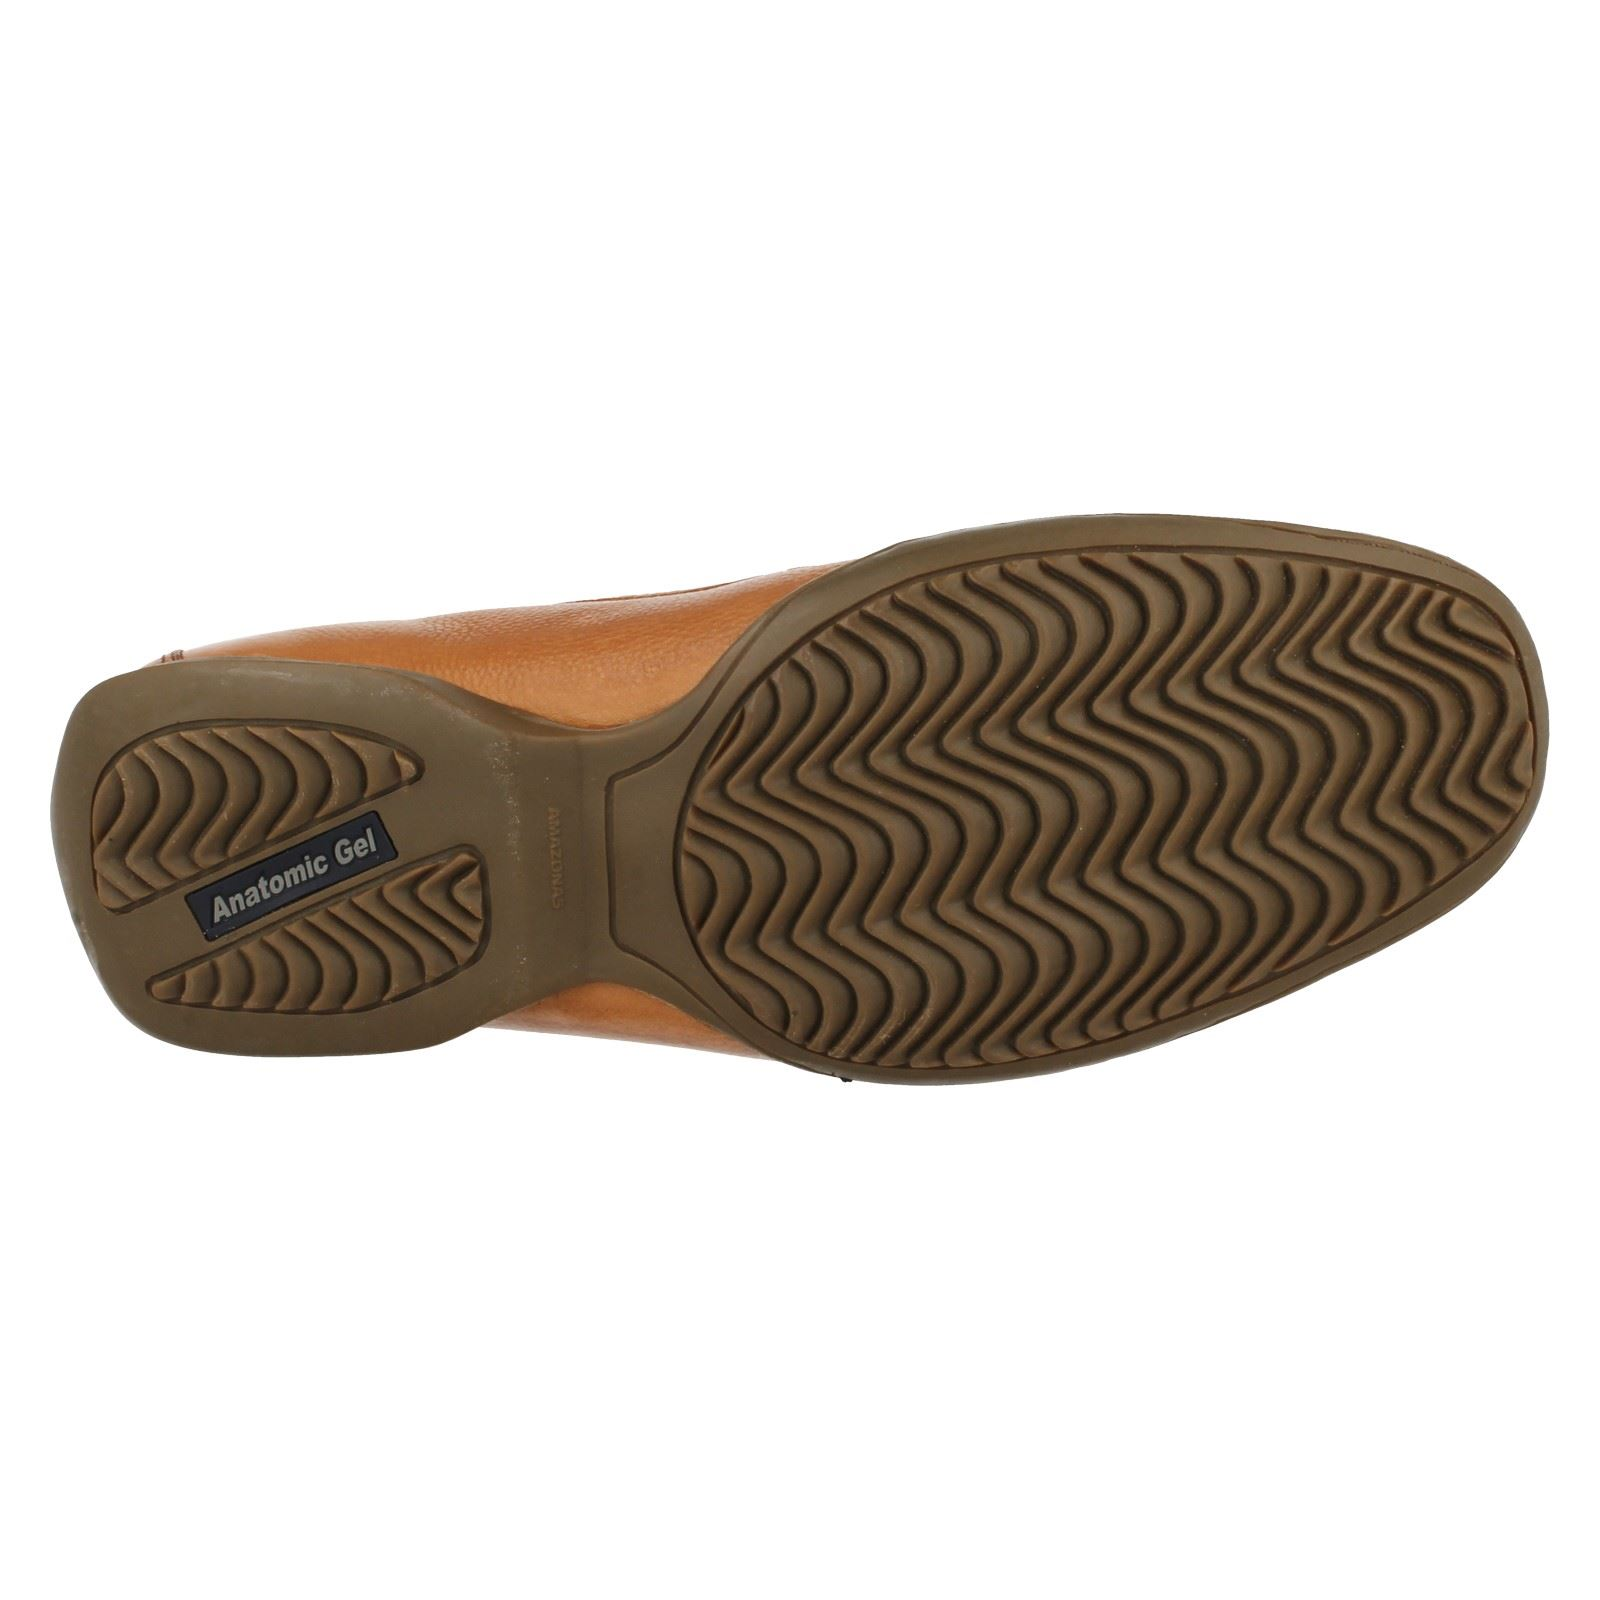 Mens Anatomic Moccasin Shoes Tavares